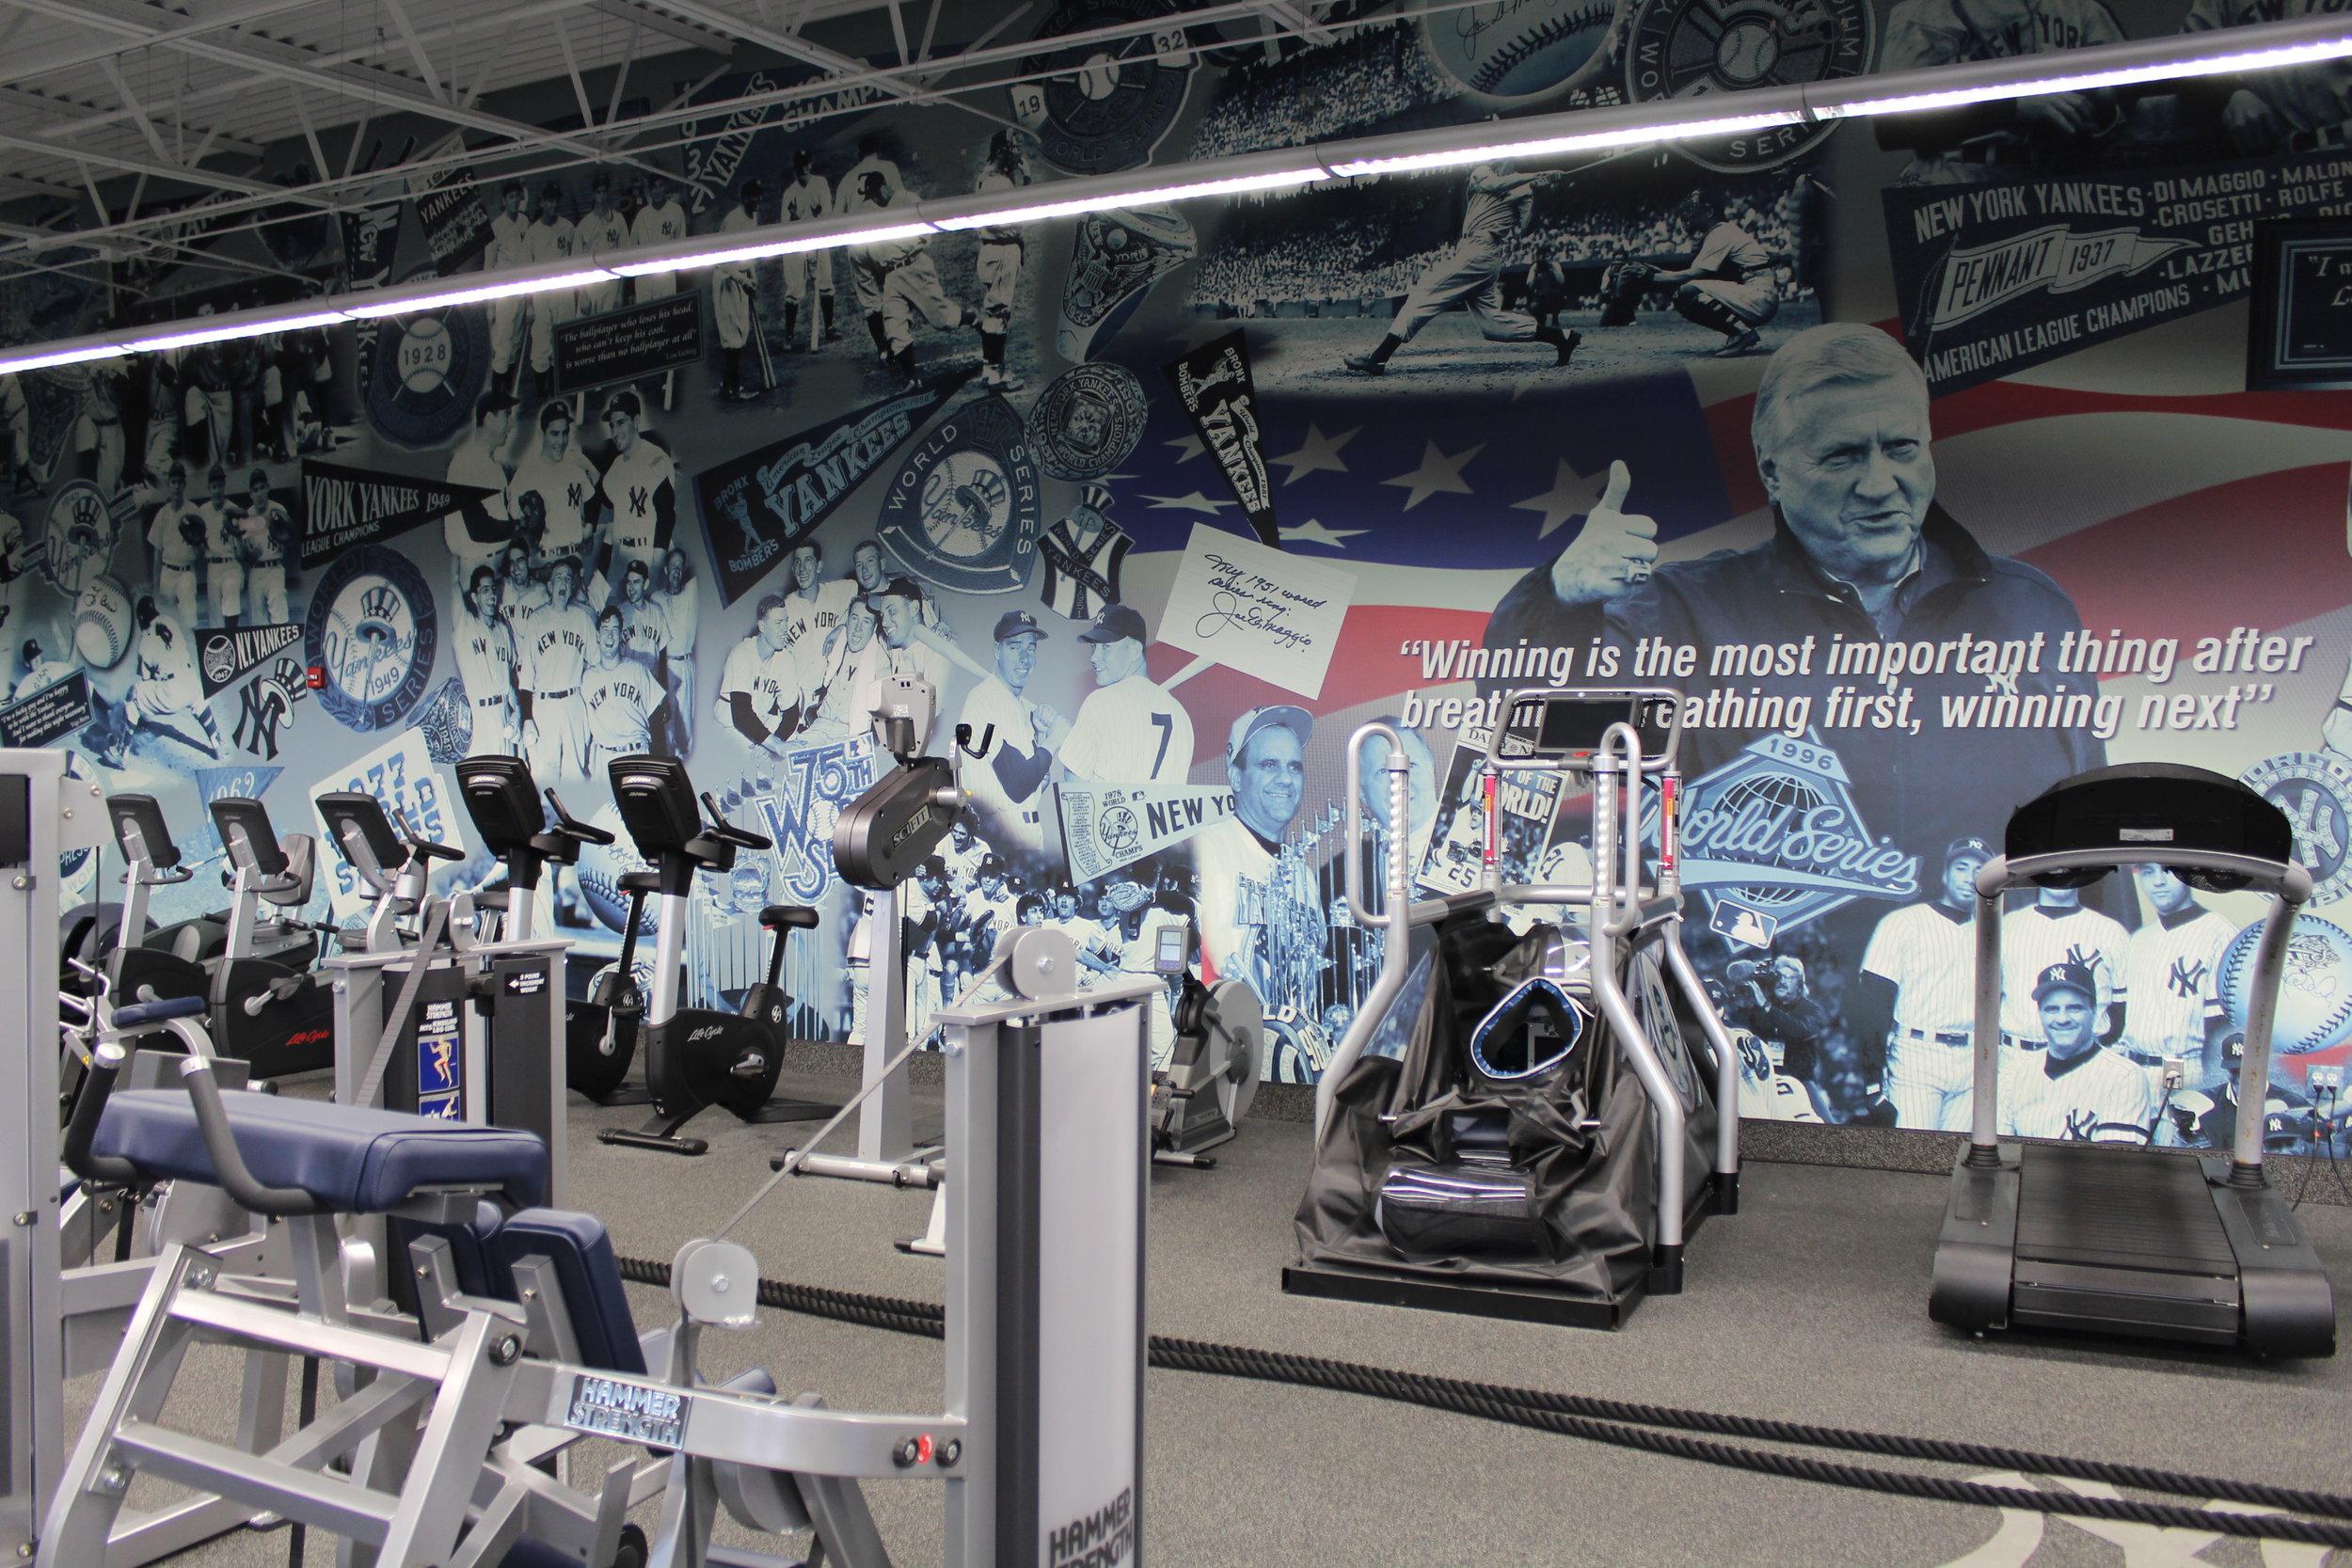 2015-06-12 NY Yankees Training Complex 030 copy.JPG